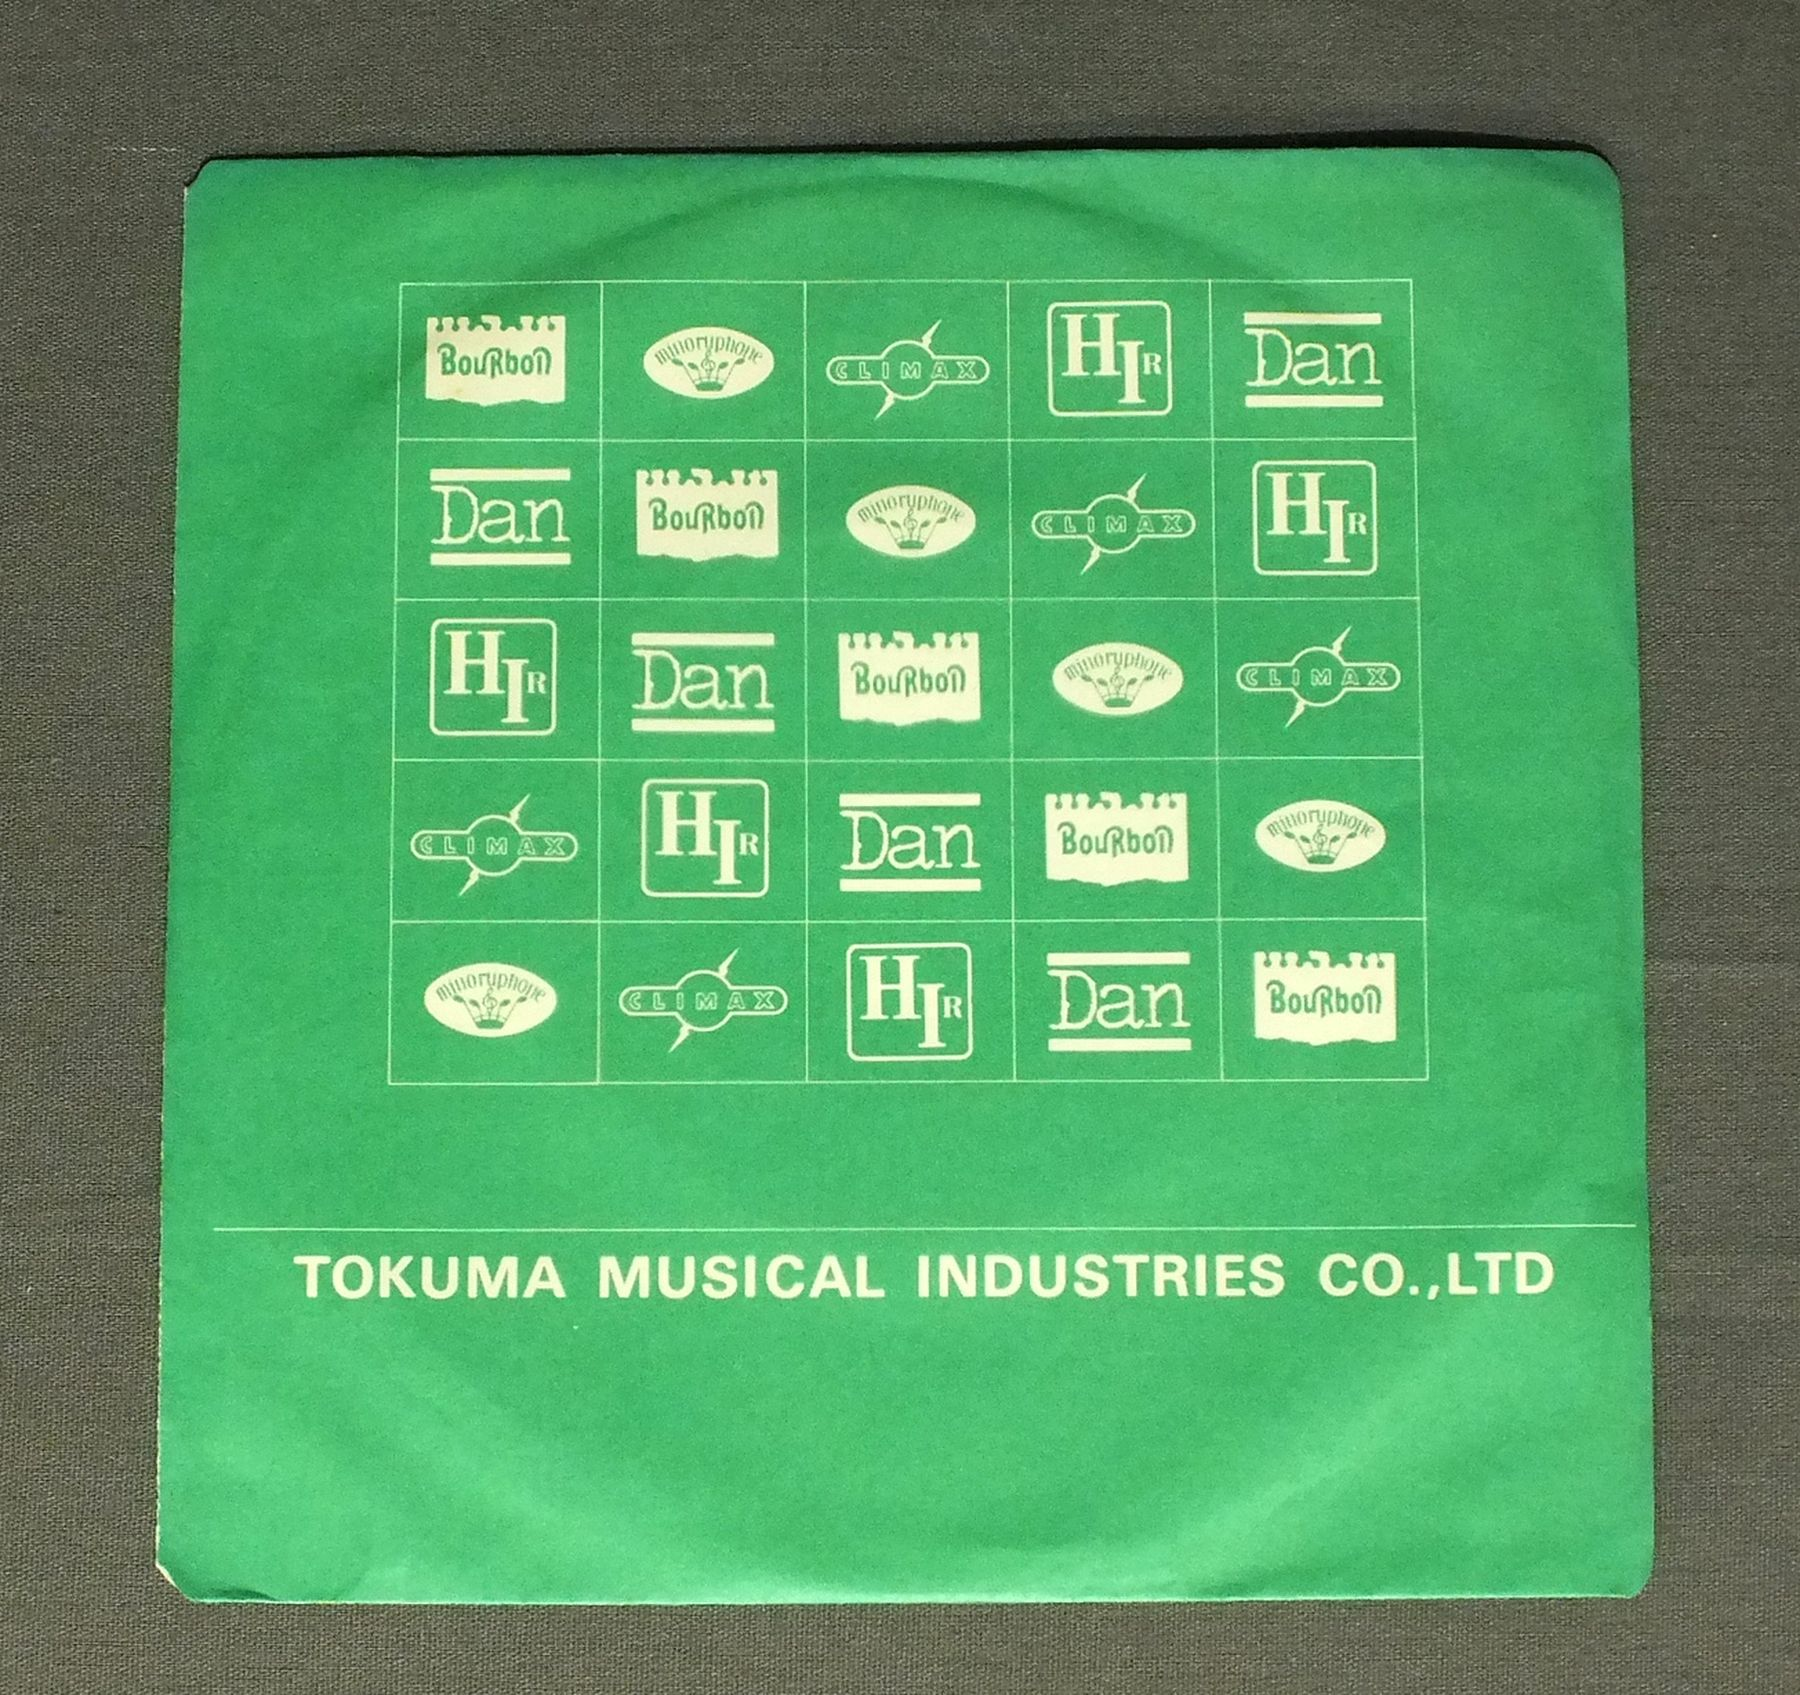 Yume koibito by Miki Fujimura, 7inch x 1 with fineday_music_records